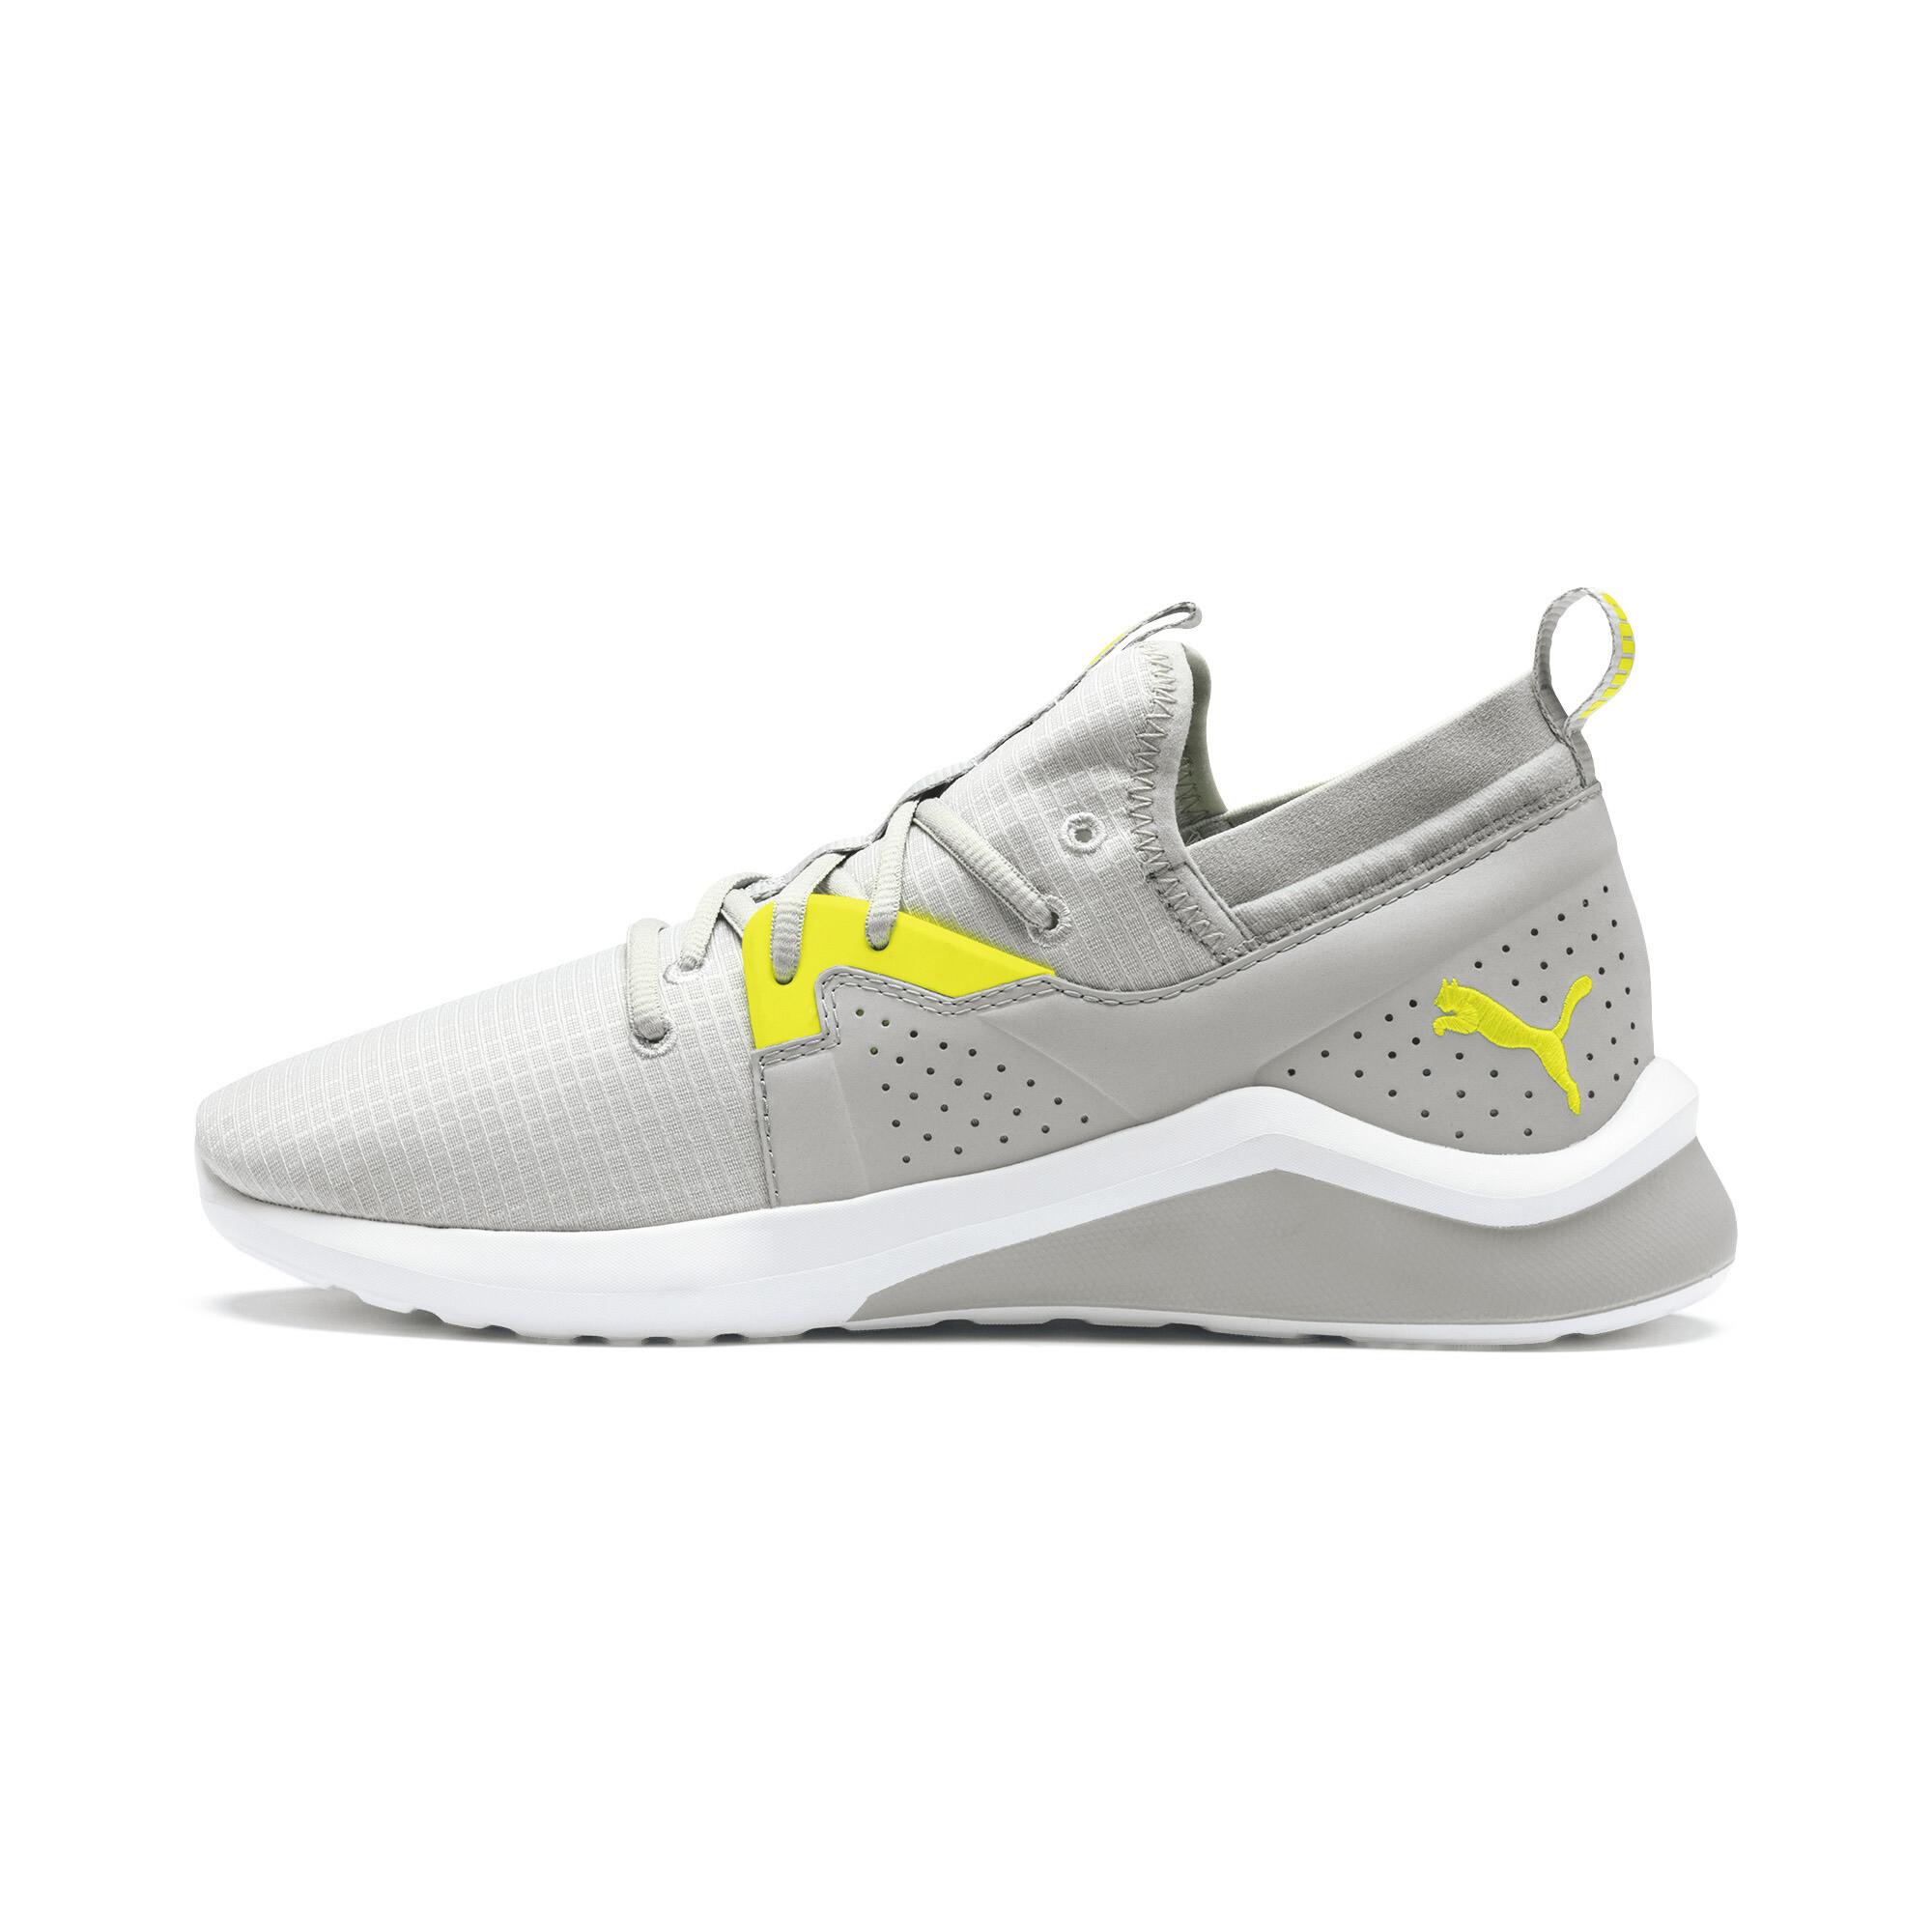 PUMA-Emergence-Lights-Men-039-s-Training-Shoes-Men-Shoe-Running thumbnail 4